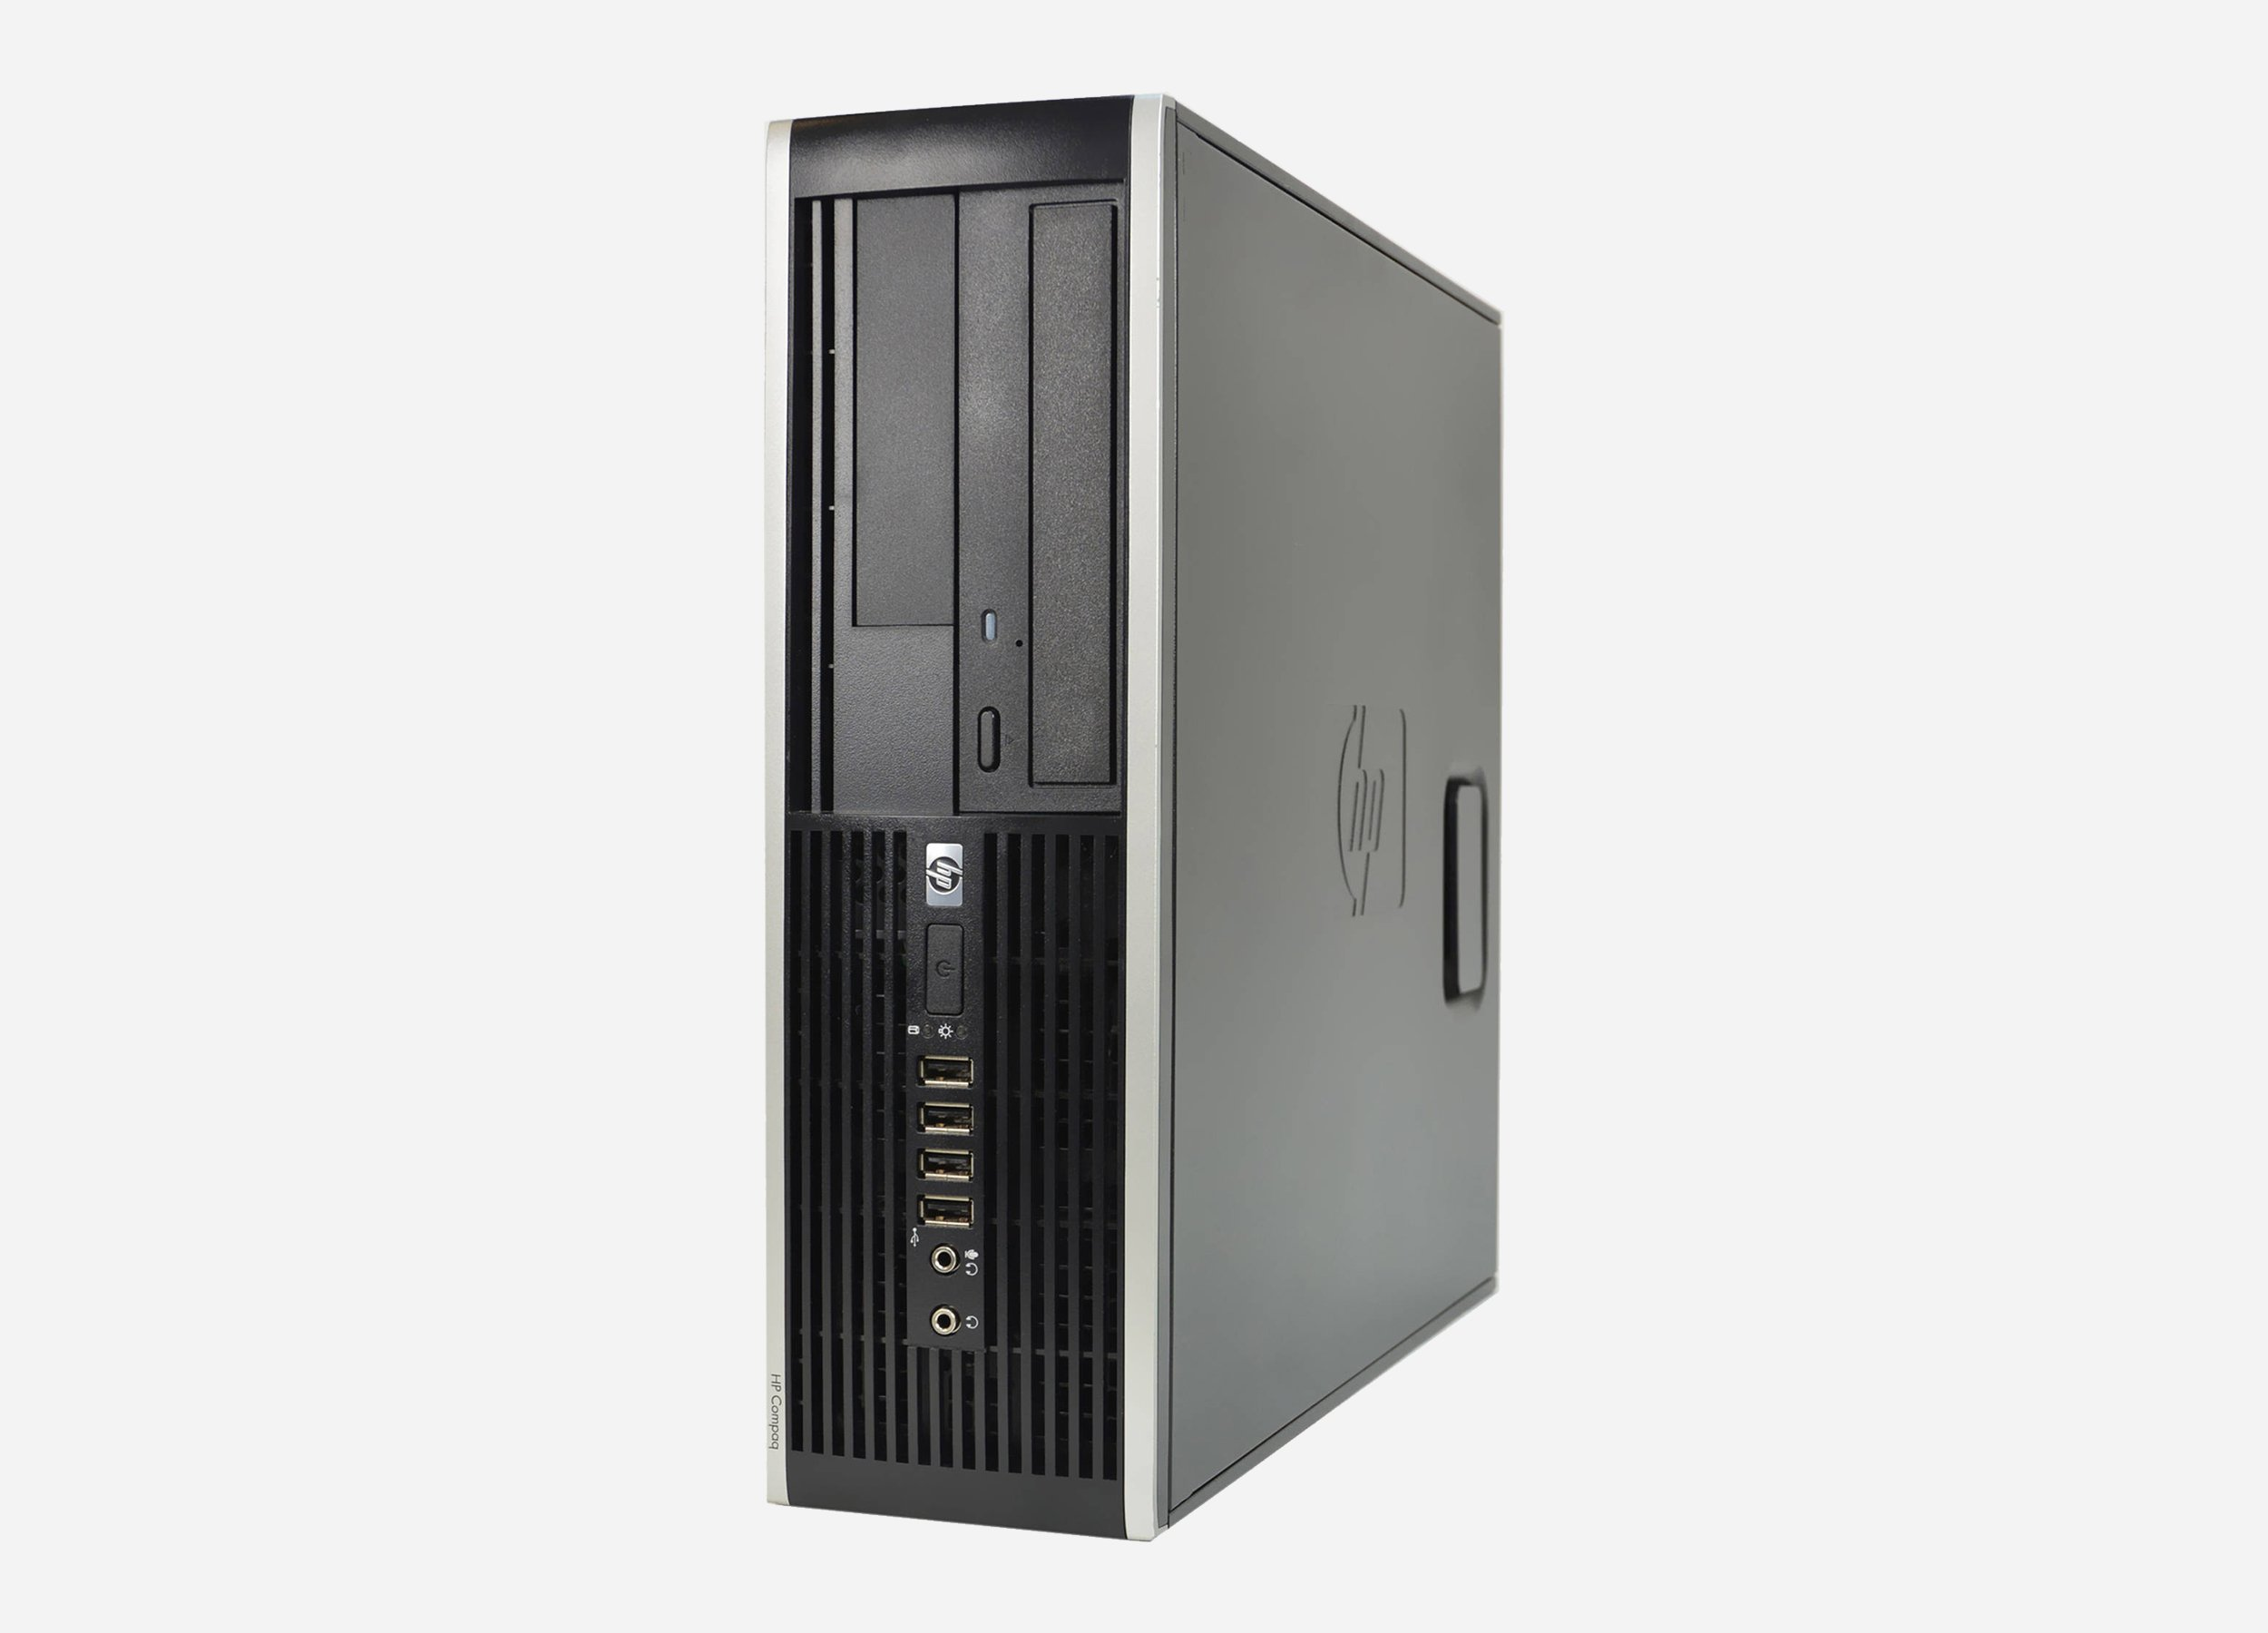 HP Compaq 6005